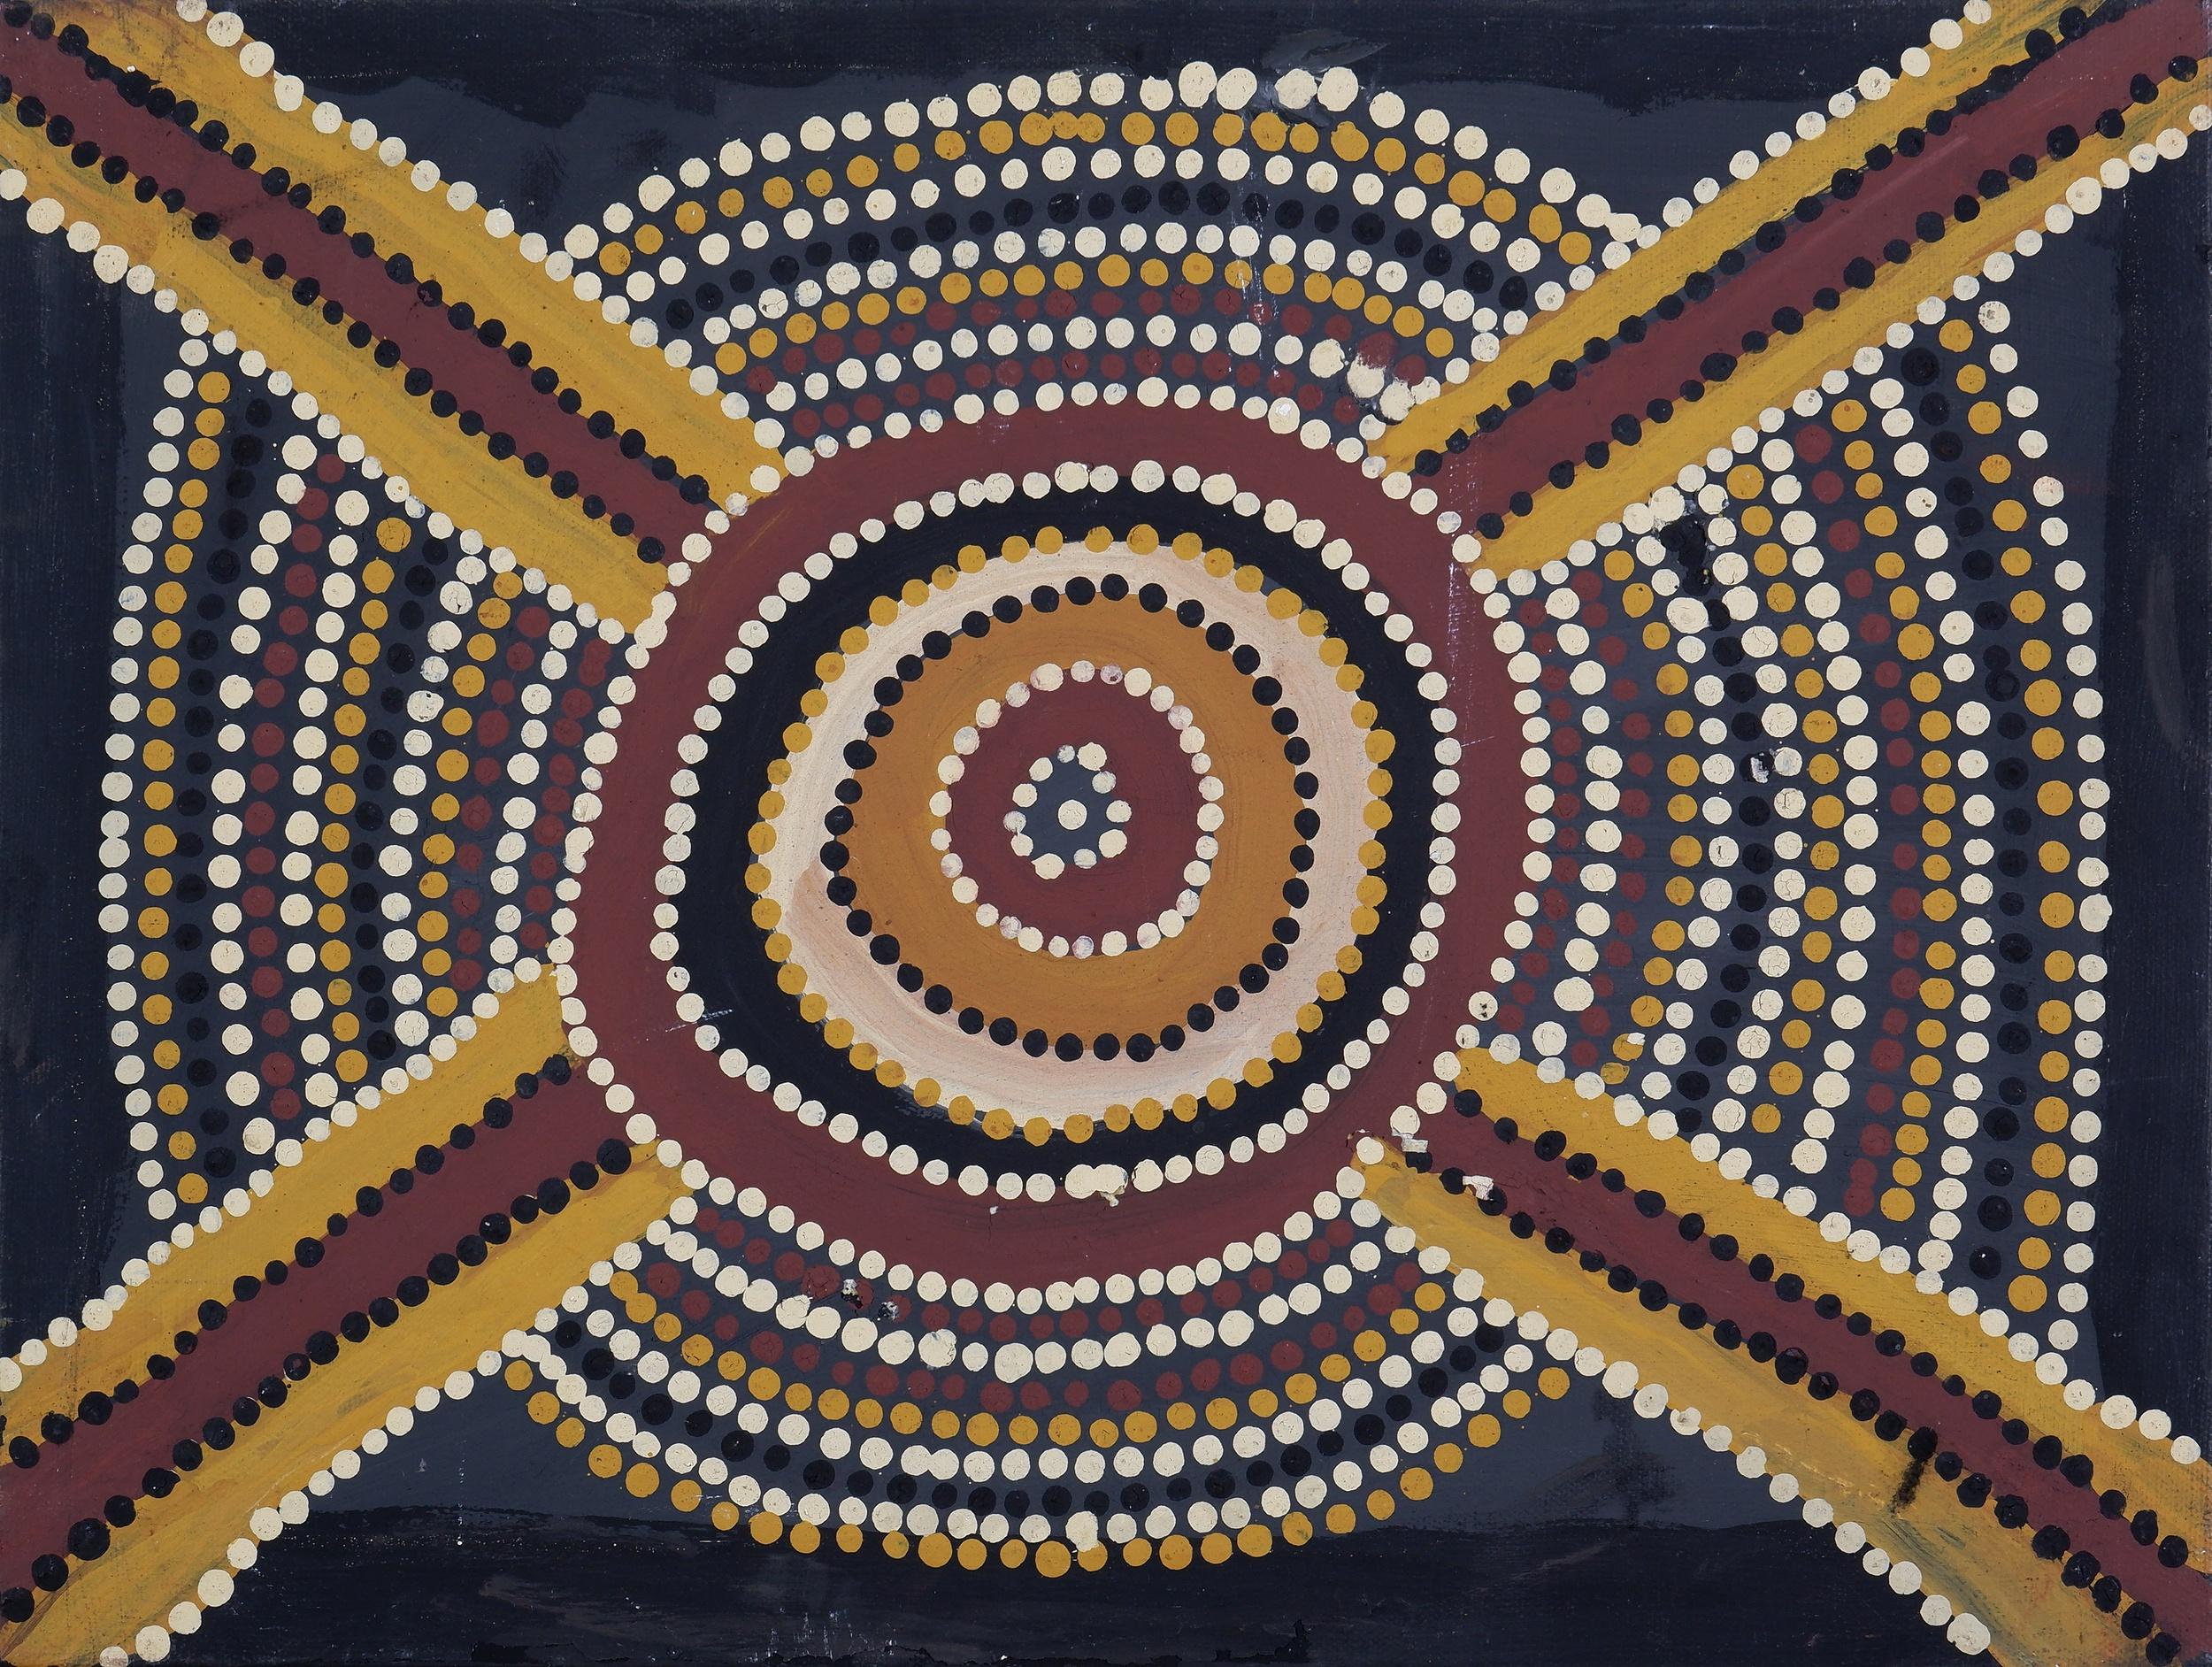 'Kittey Malarvie (born 1939, Djaru language group), Birrawoorl, Natural Ochres and Pigments on Canvas, 30 x 40 cm'